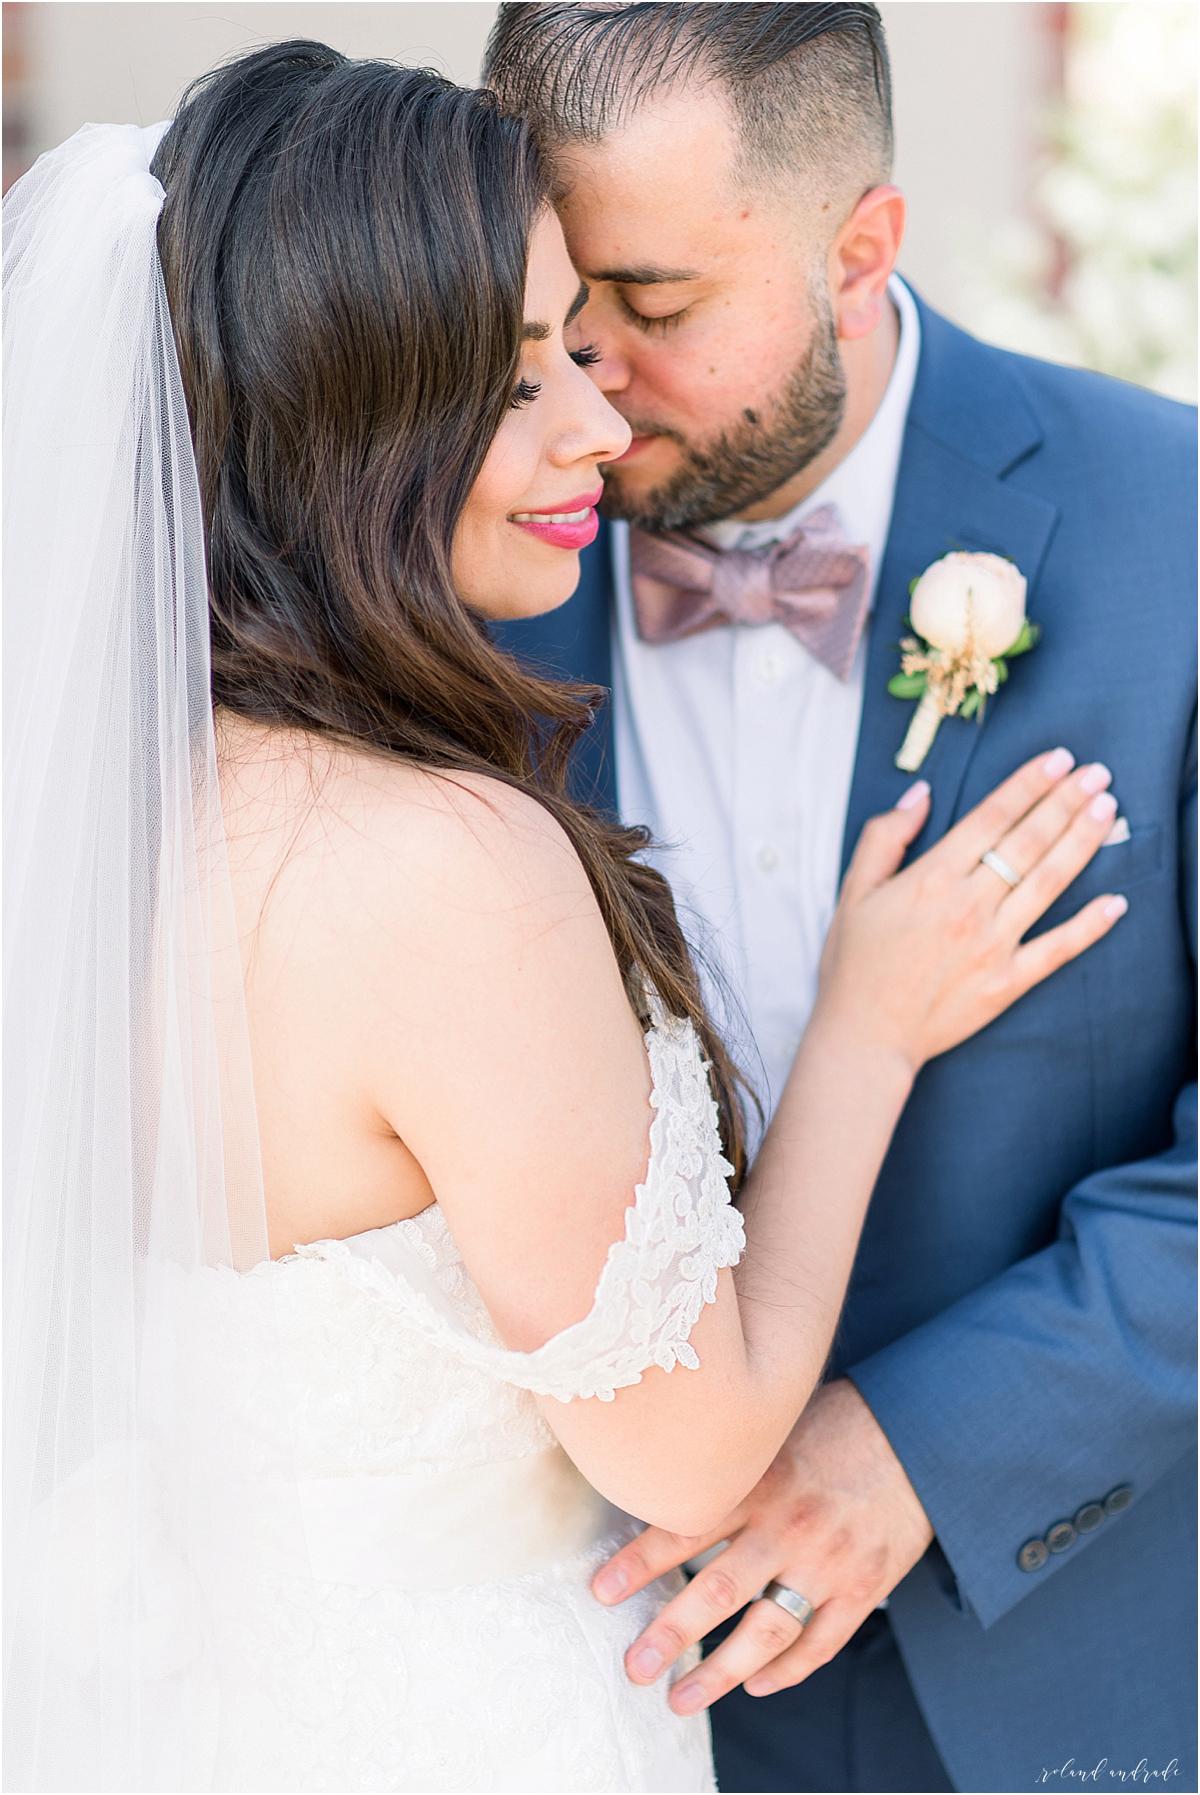 Rancho Los Guzman Wedding Joliet, Joliet Wedding, Joliet Wedding Photographer, Chicago Wedding Photographer, Best Photographer In Joliet, Best Photographer In Chicago, Light And Airy Photographer Chicago_0064.jpg